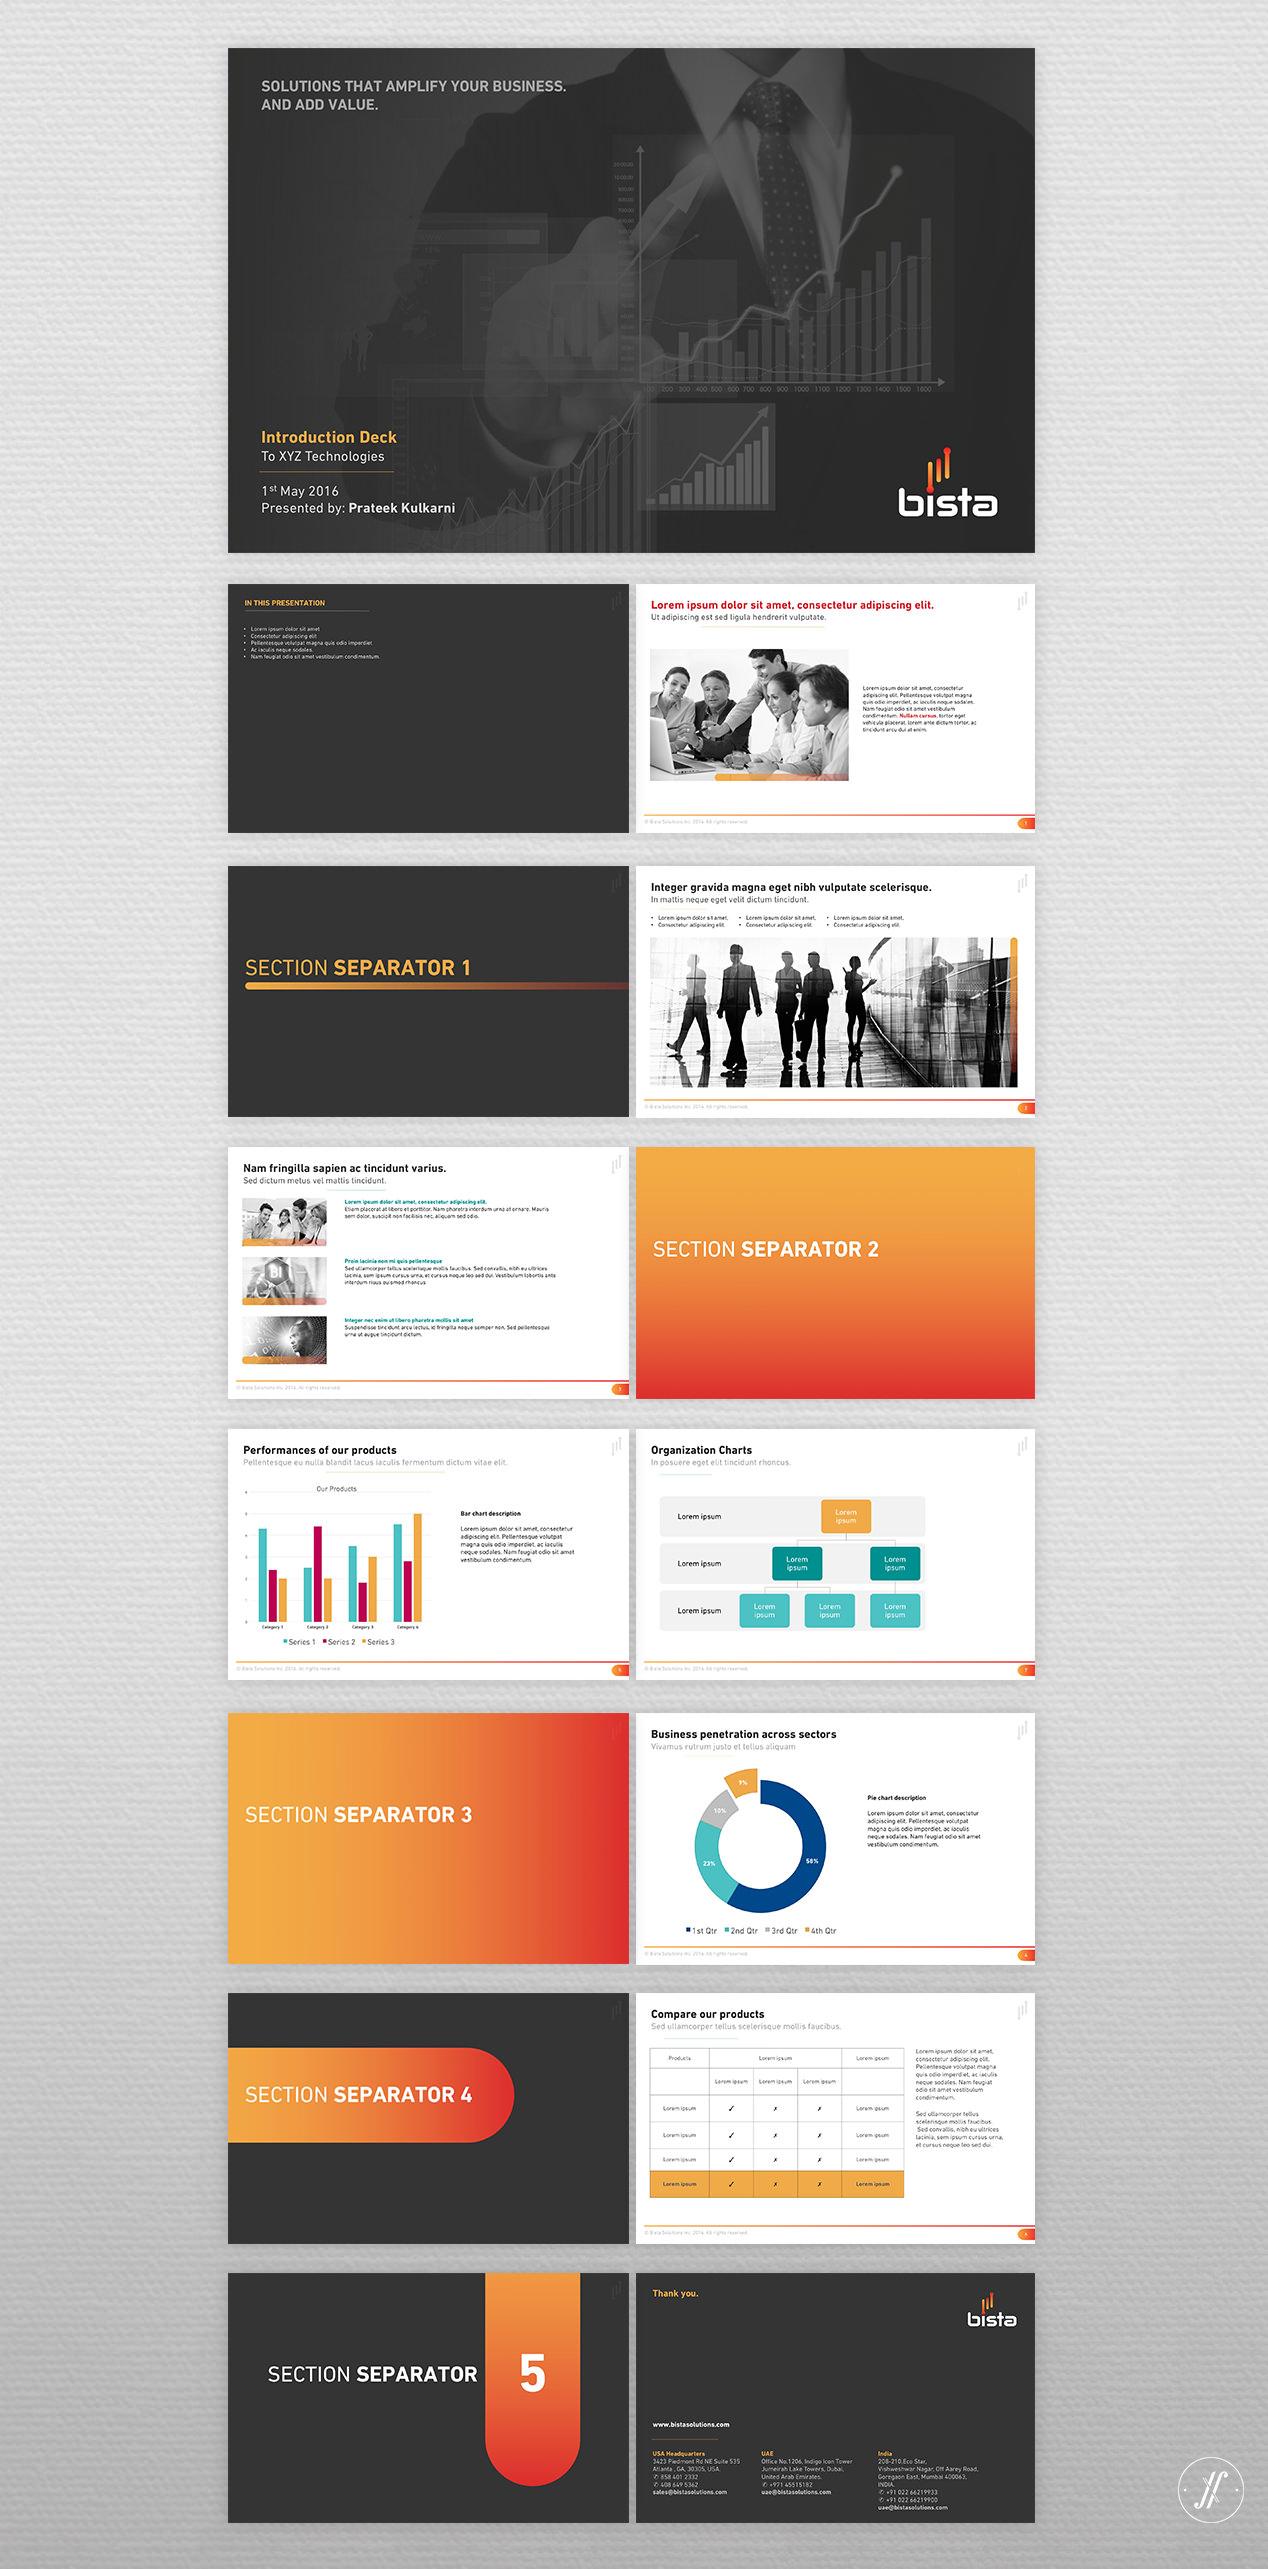 Yellow-Fishes-Mumbai-Branding-Agency-Corporat-Branding-Case-Study-Bista-Solutions-Presentation-Tempalte-Design